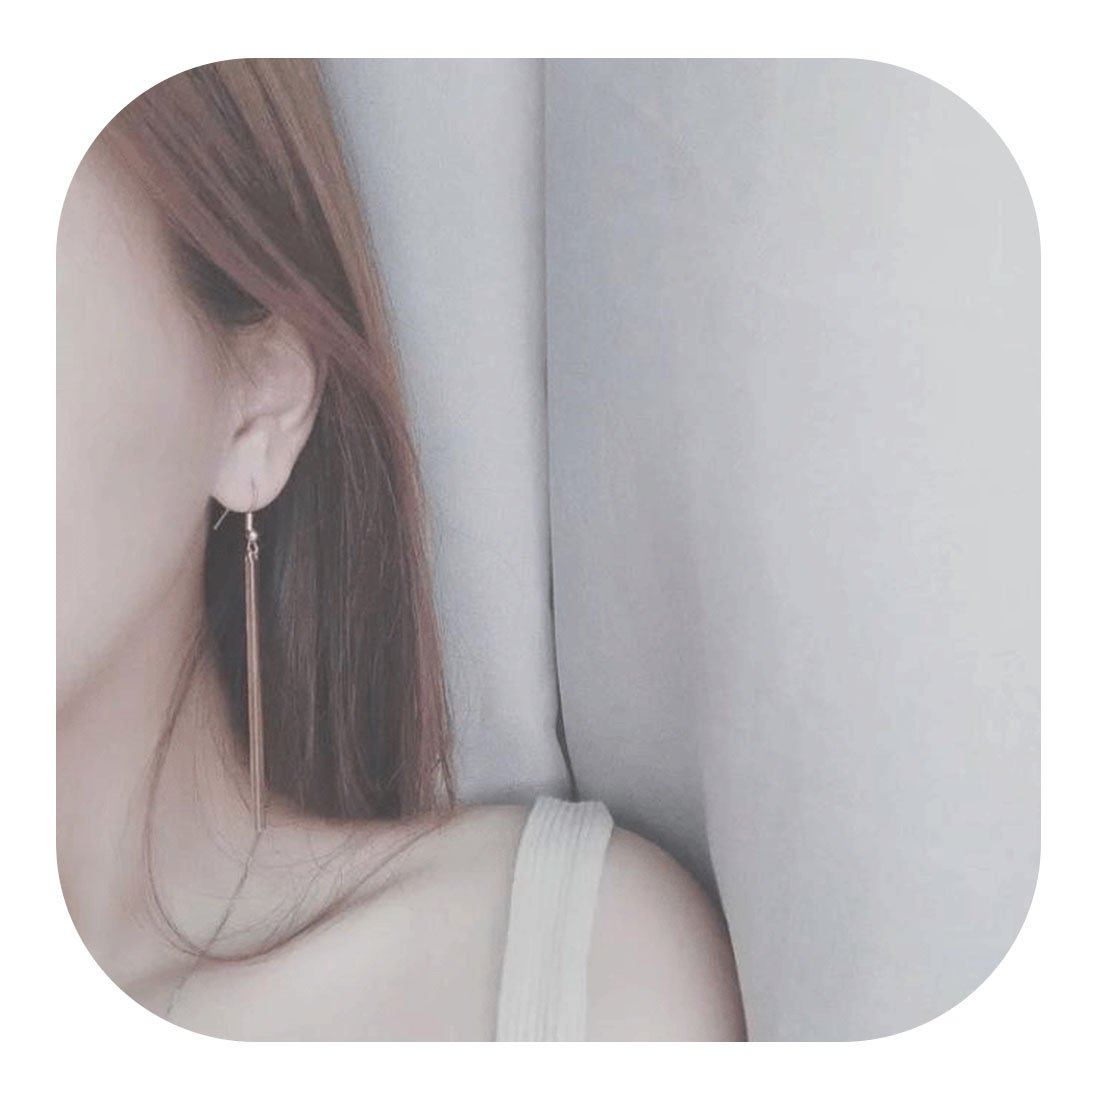 Molyveva Vertical Bar Dangle Earrings Minimalist Drop Dangle Earrings Bar Earrings Line Simplify Earrings